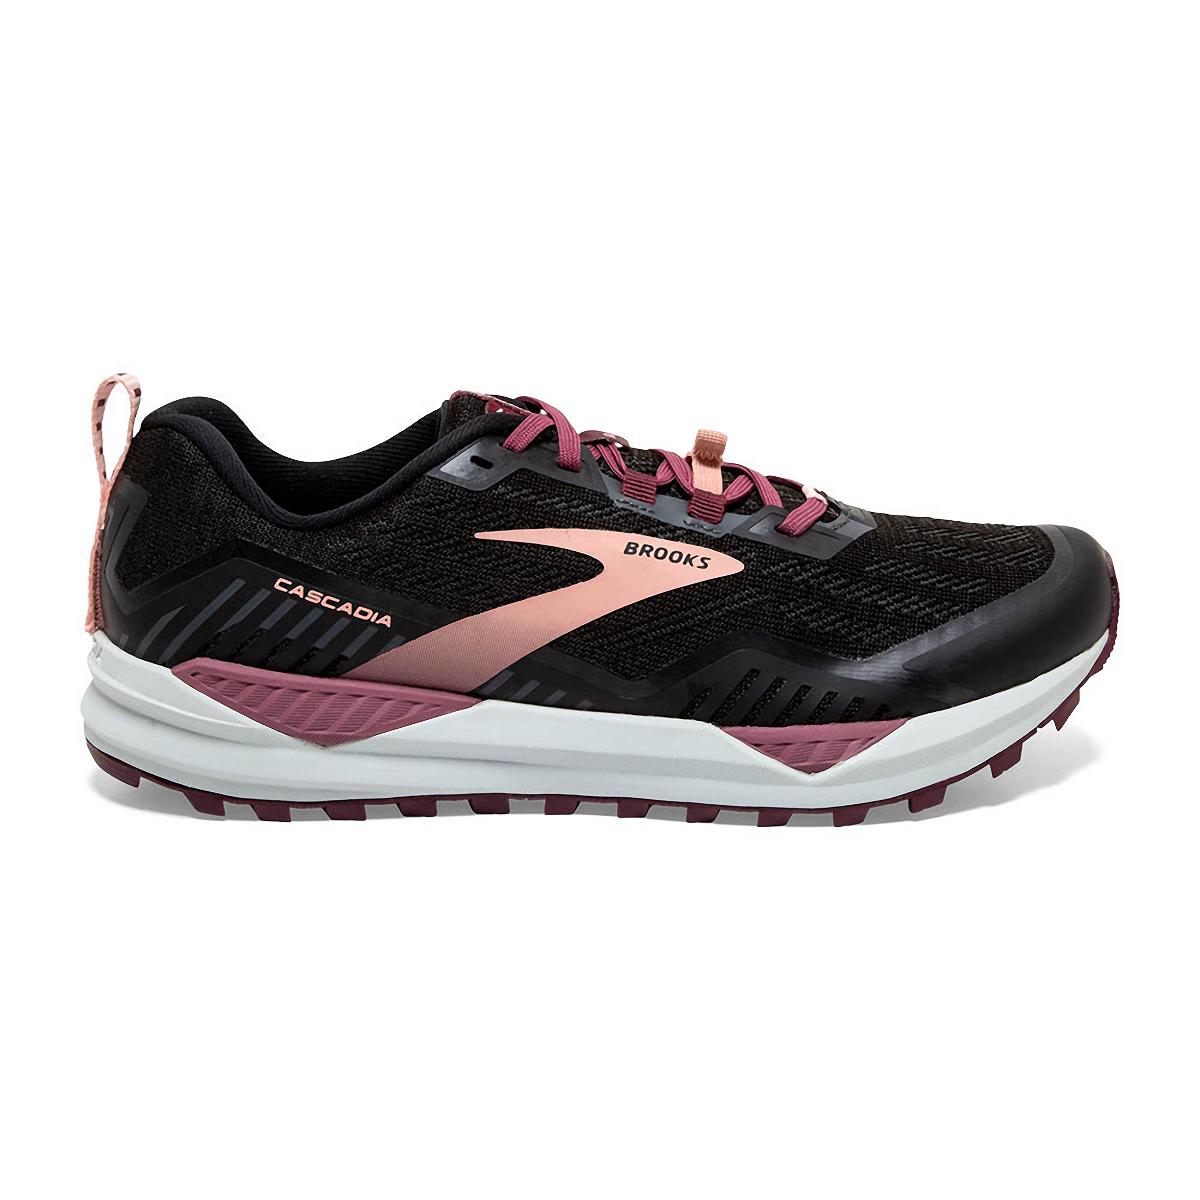 Women's Brooks Cascadia 15 Trail Running Shoe - Color: Black/Ebony/Coral - Size: 10.5 - Width: Regular, Black/Ebony/Coral, large, image 1